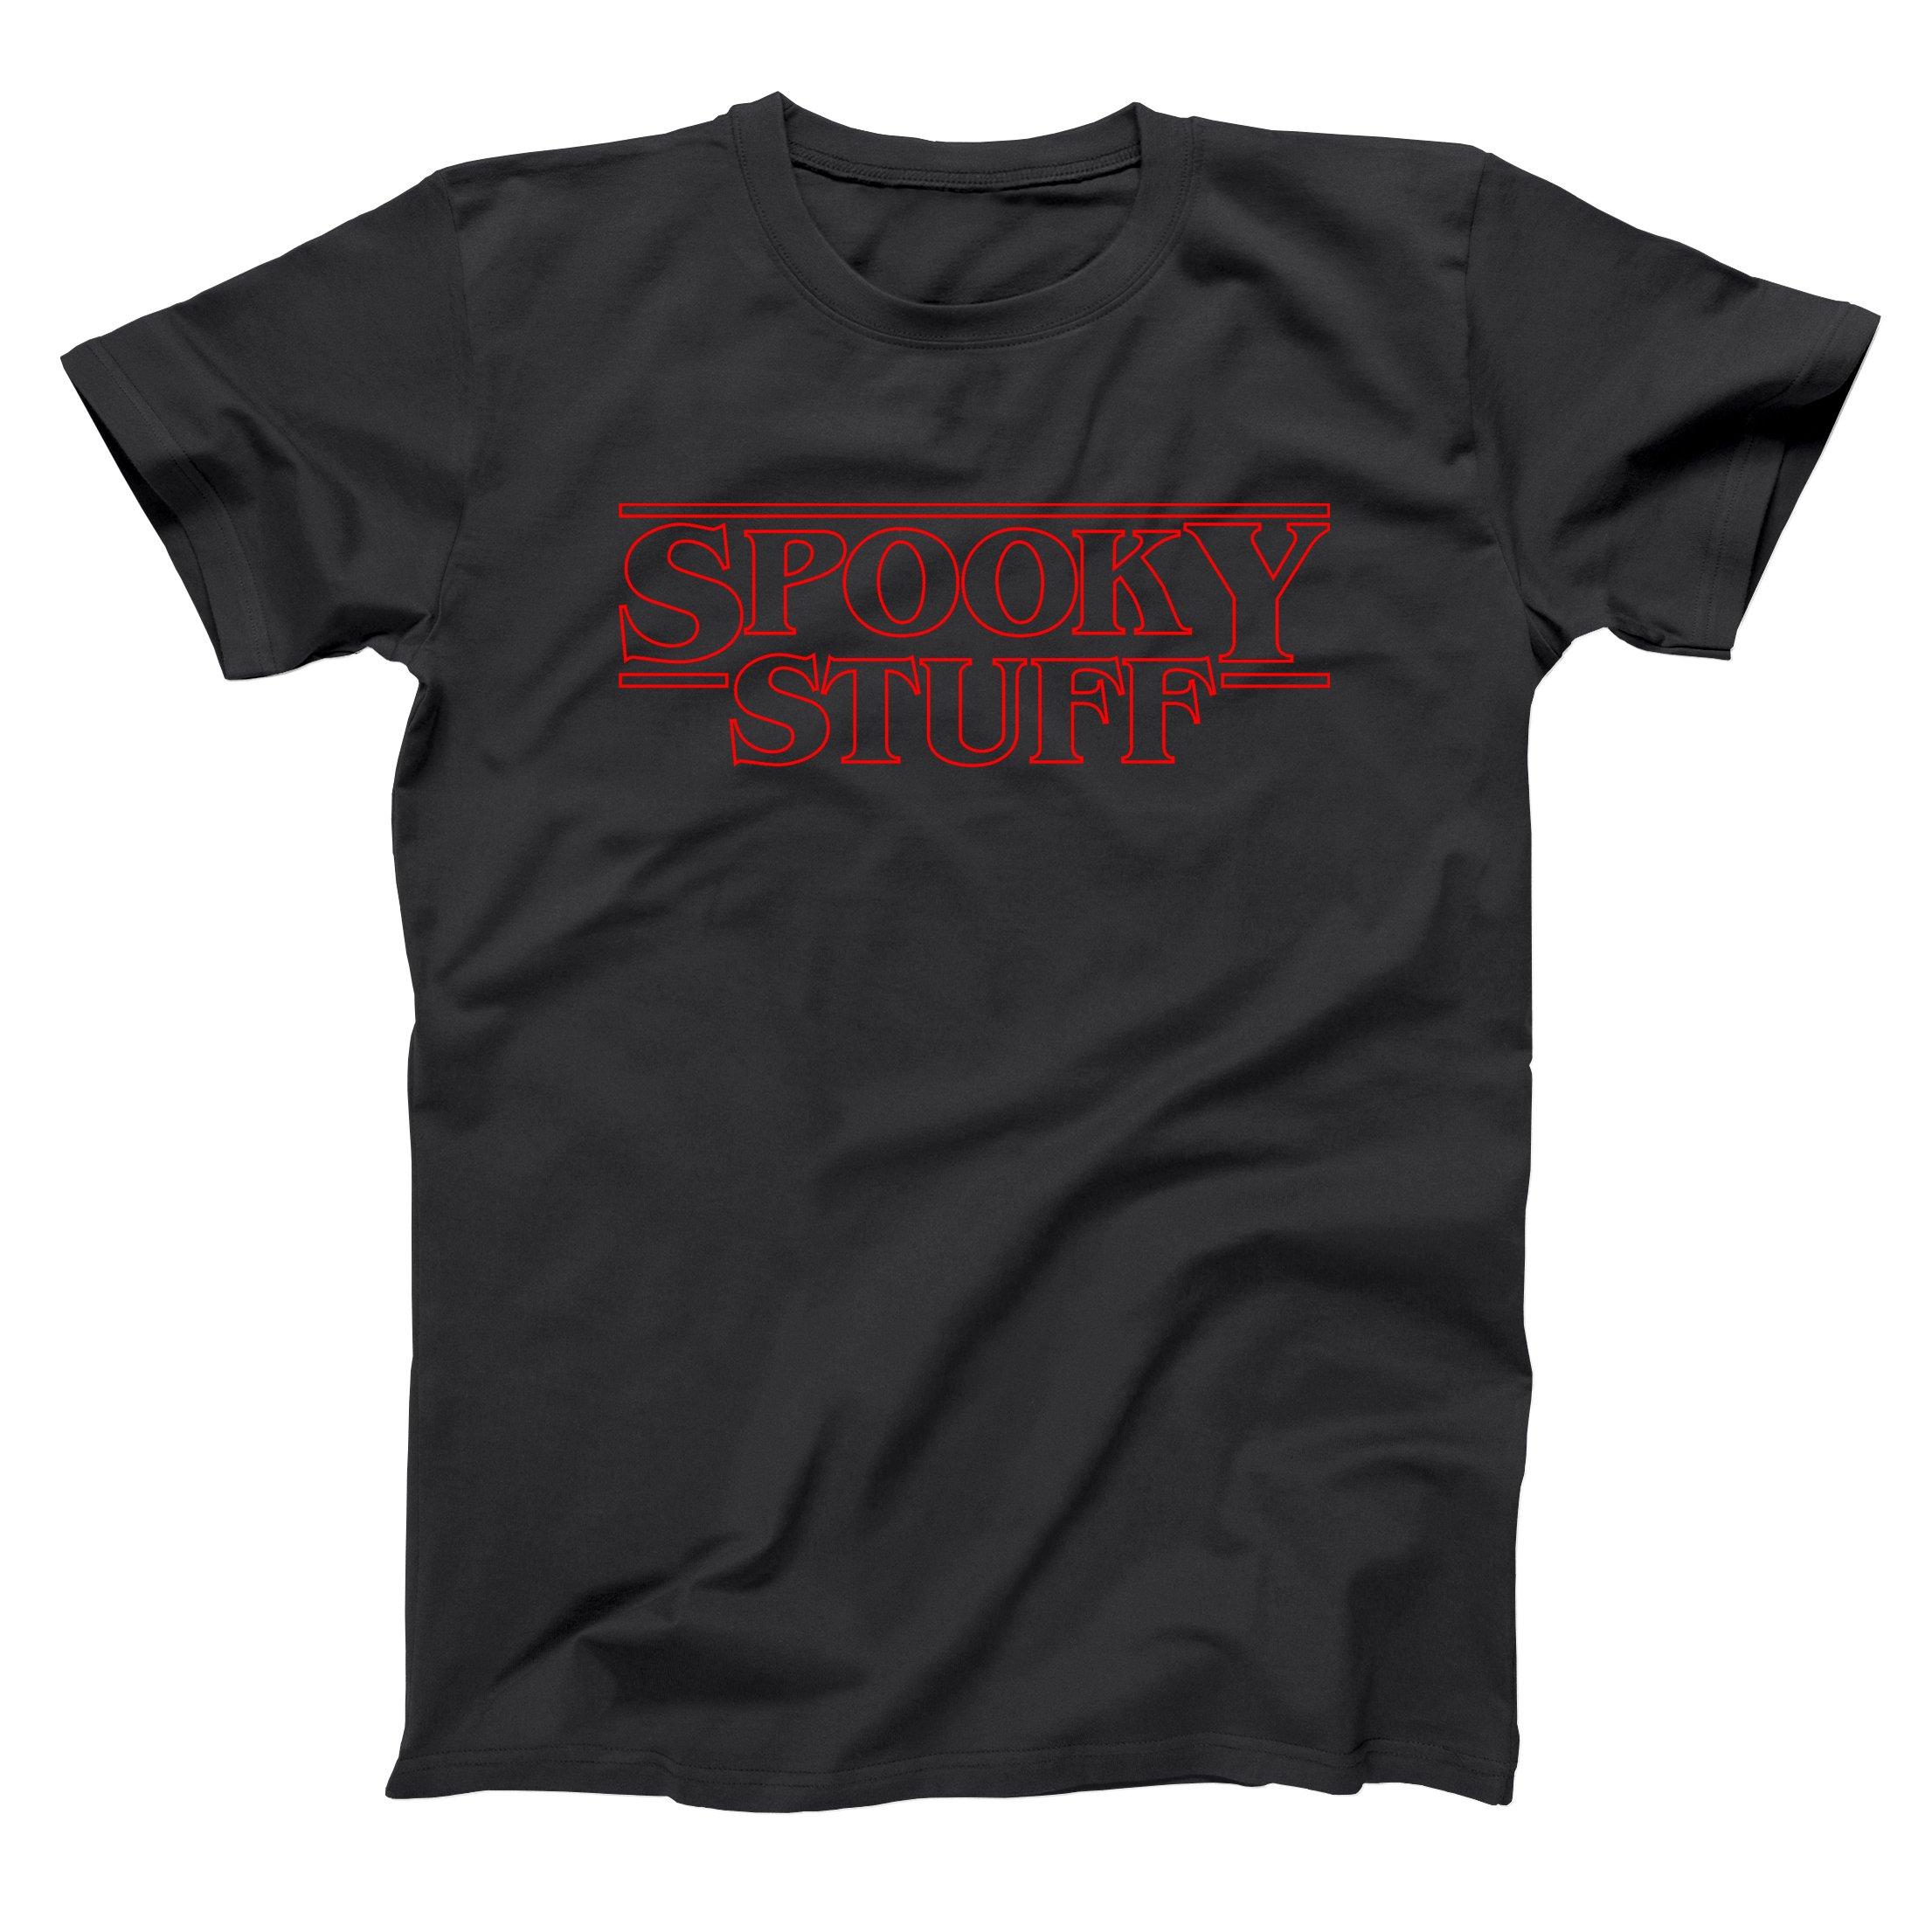 Spooky Stuff T Shirt